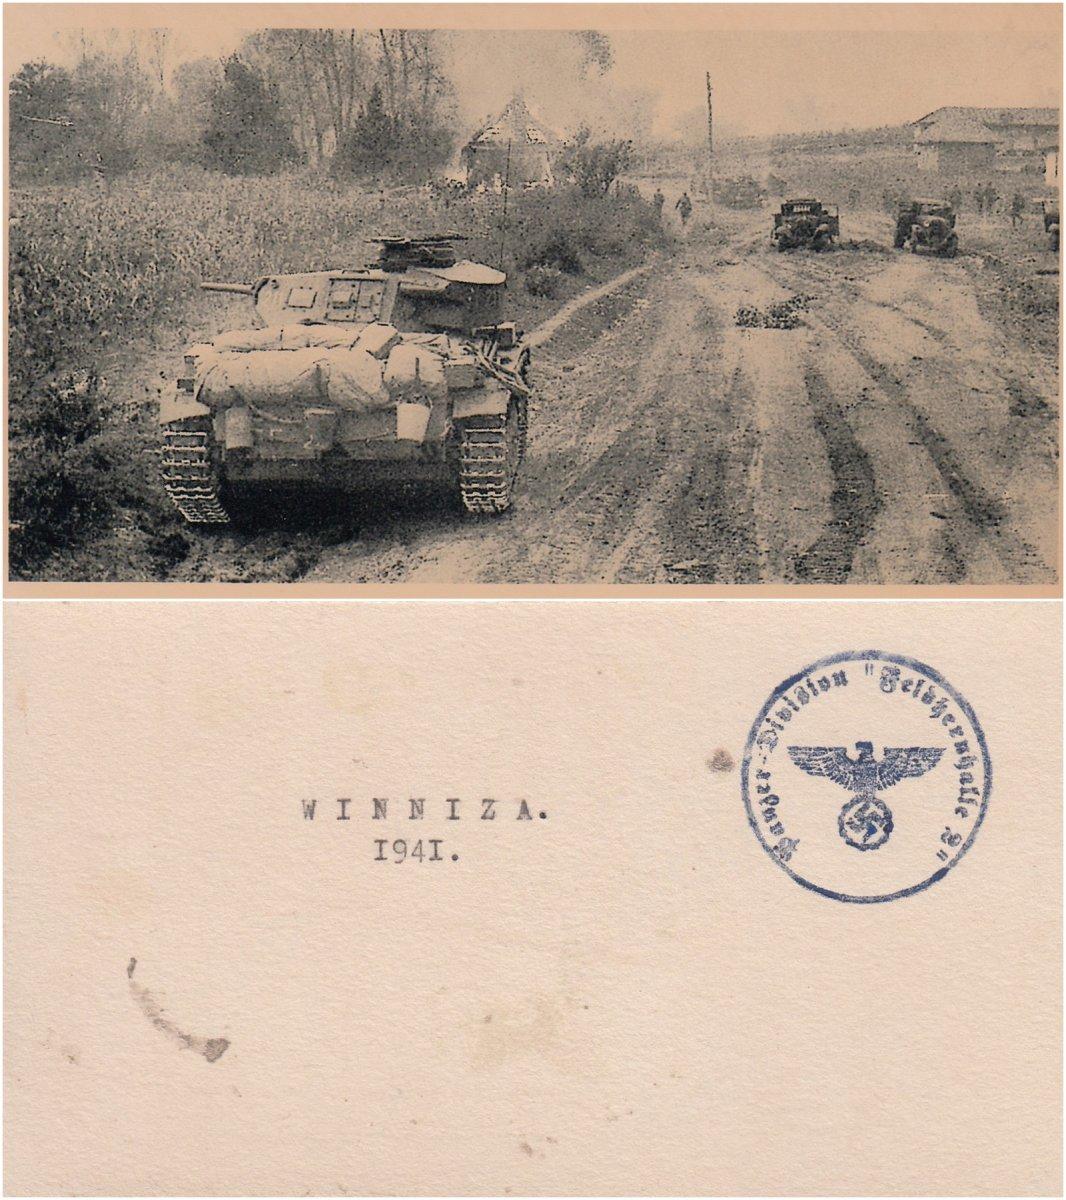 Винница Окрестности 1941 г. page.jpg